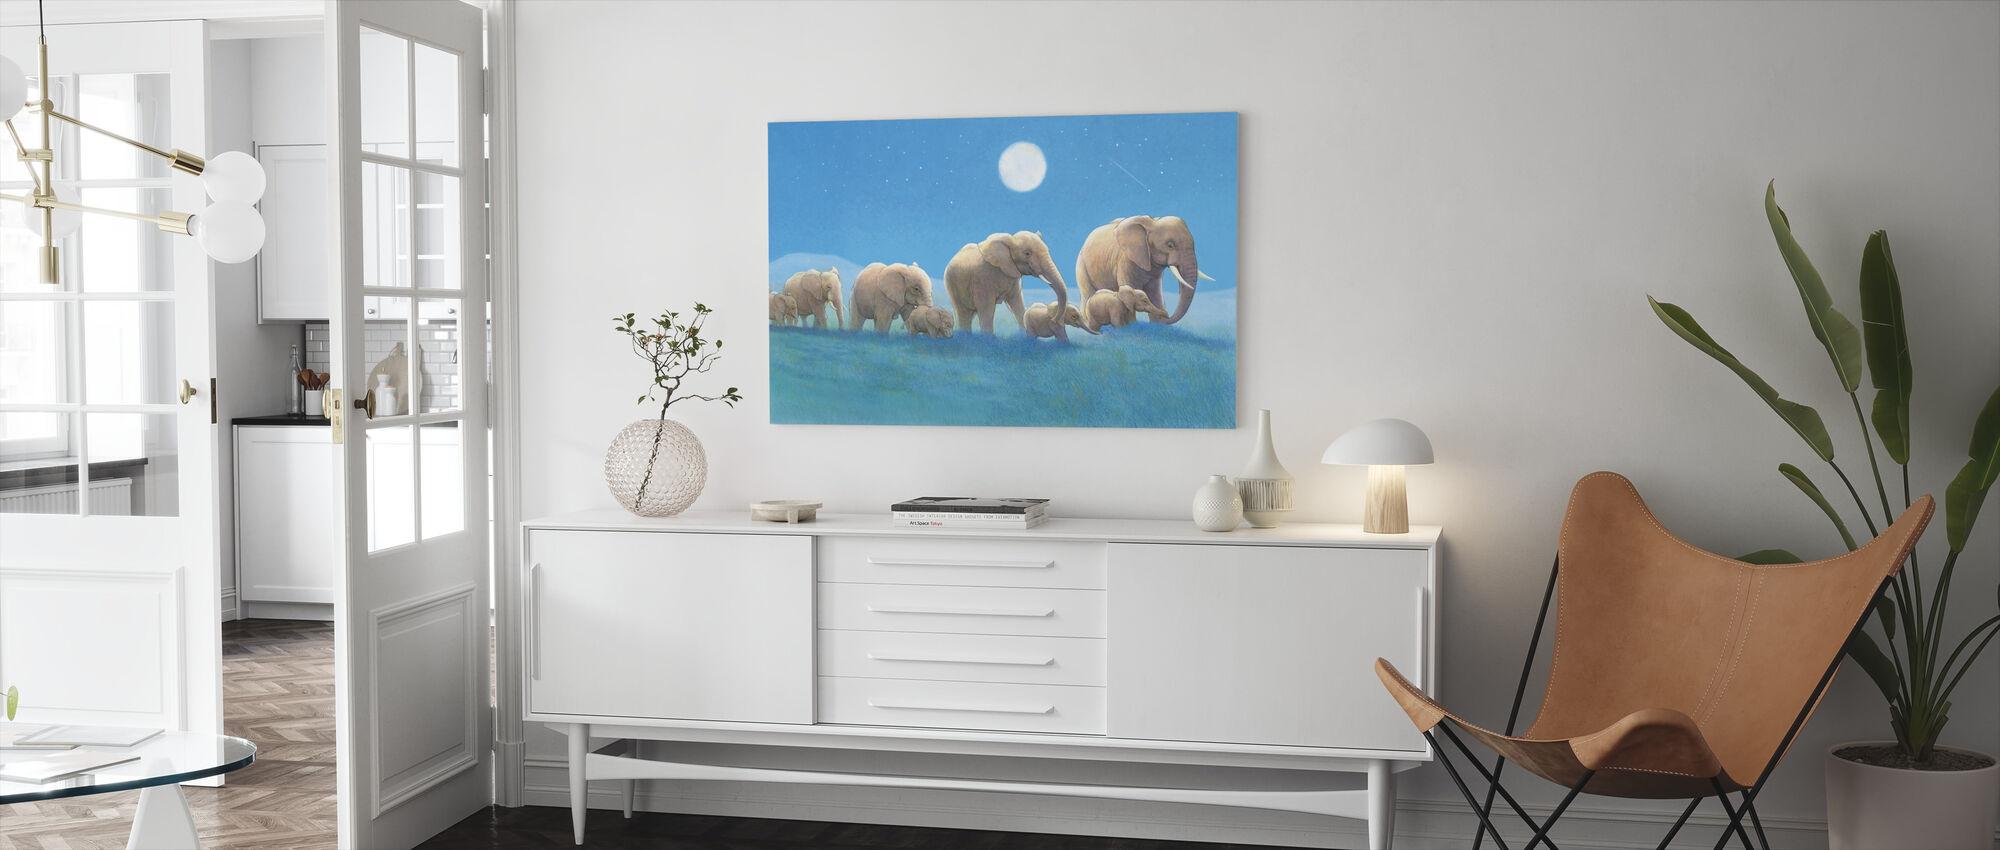 Olifanten lopen - Canvas print - Woonkamer